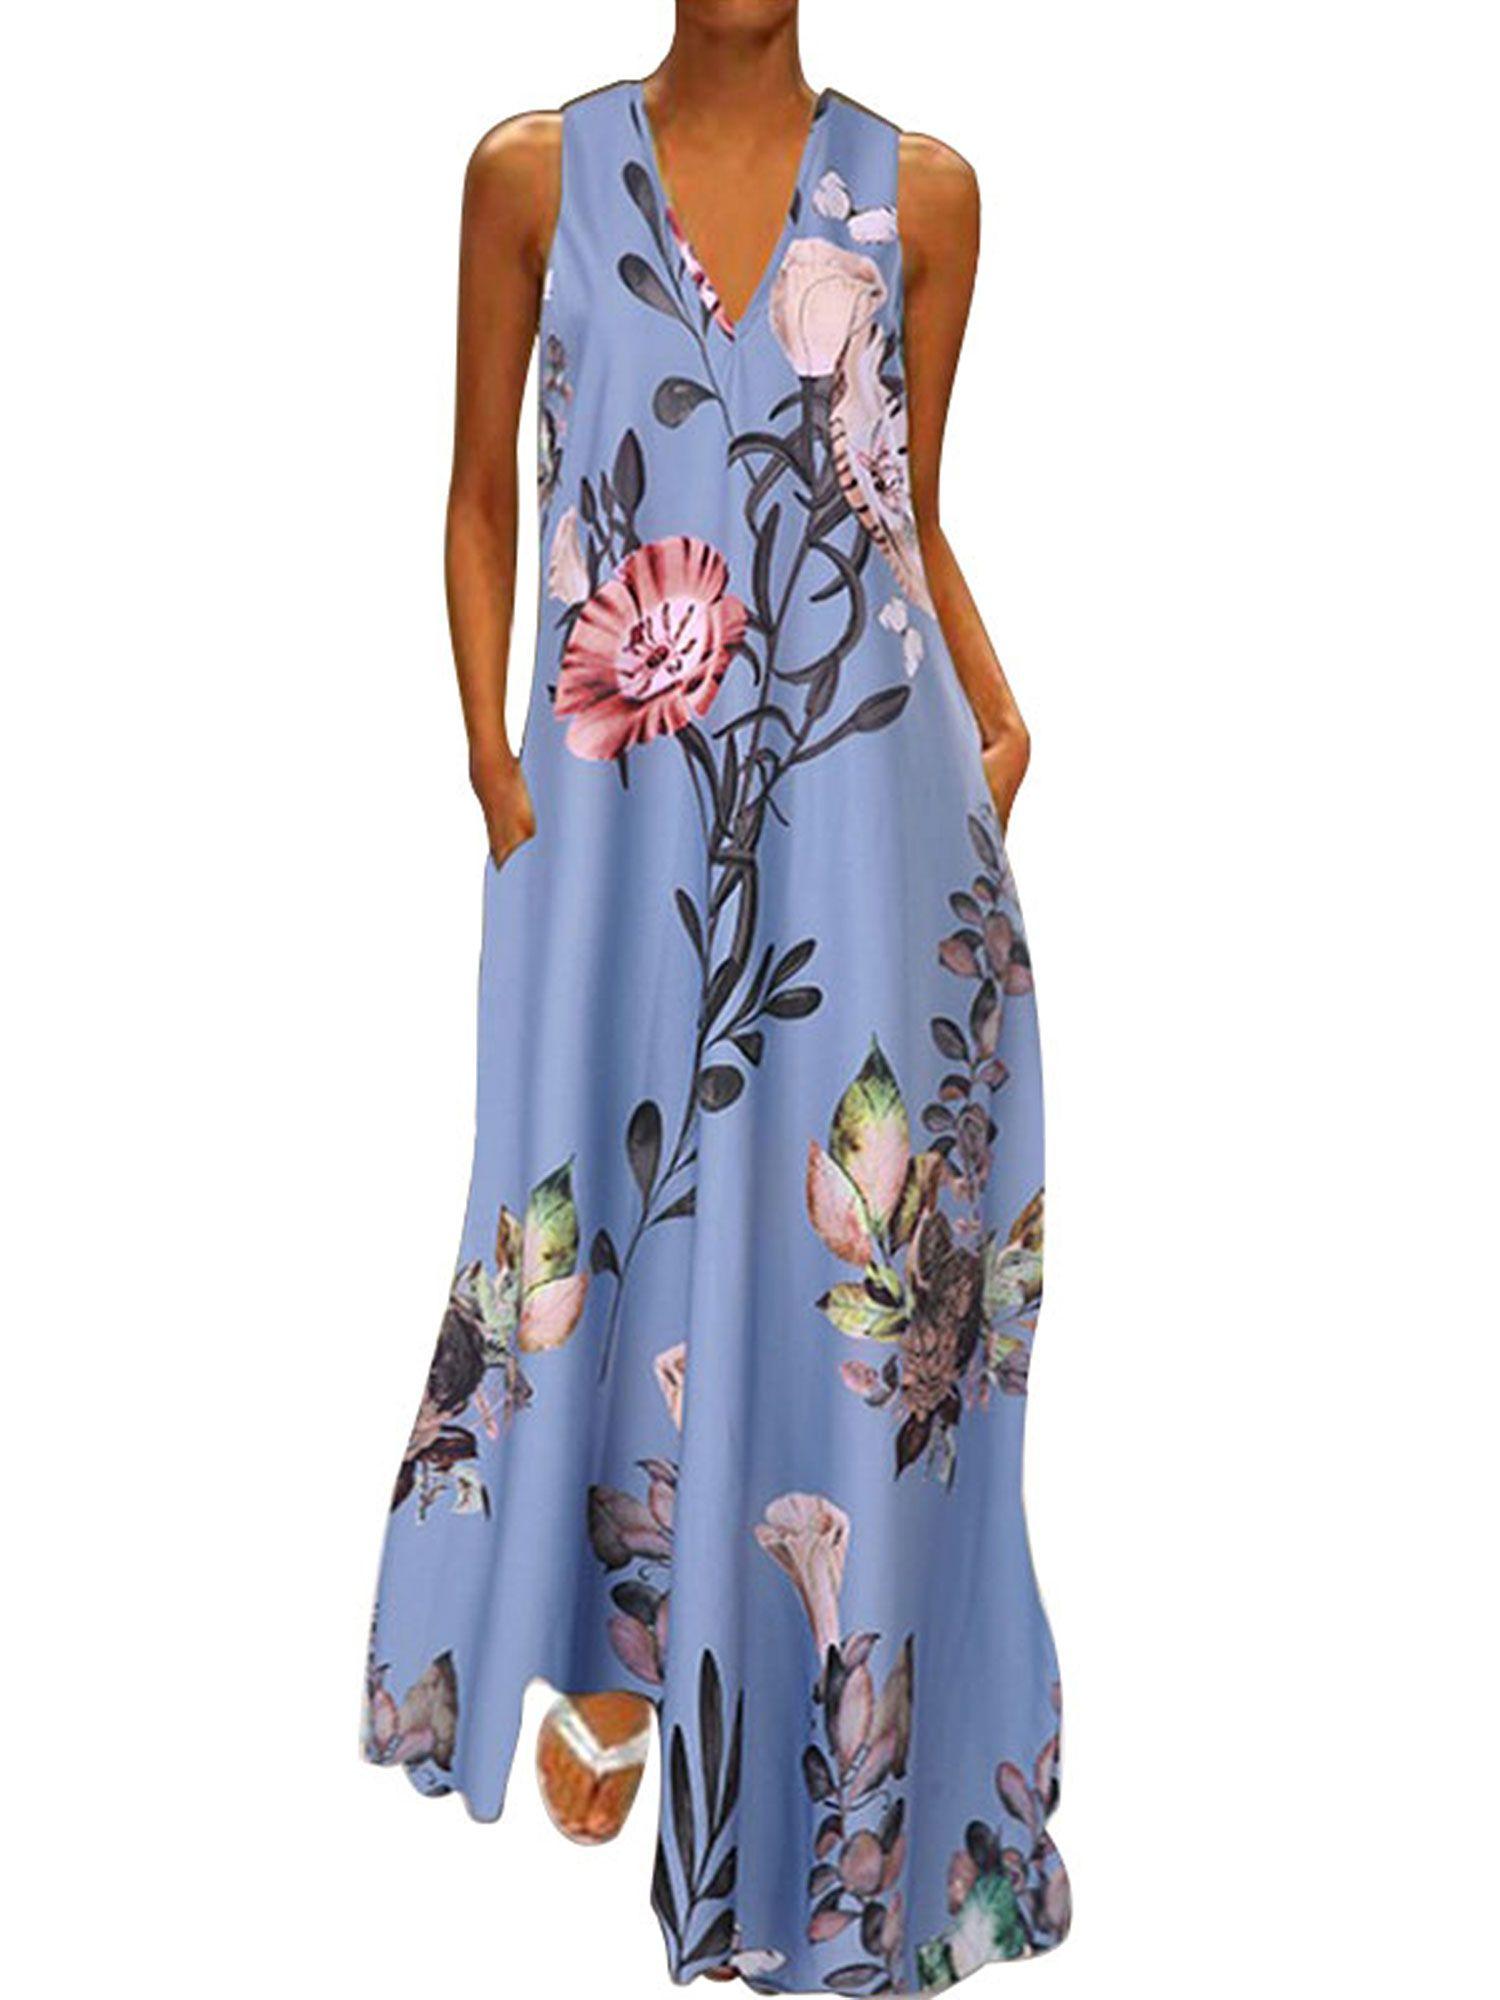 Ukap Plus Size Bohemia Dress Women Sleeveless Floral Print Summer Beach Holiday Sundress Long Maxi Dress Evening Party Cocktail Walmart Com Maxi Dress Evening Long Sundress Maxi Dress Summer Beach [ 2000 x 1500 Pixel ]